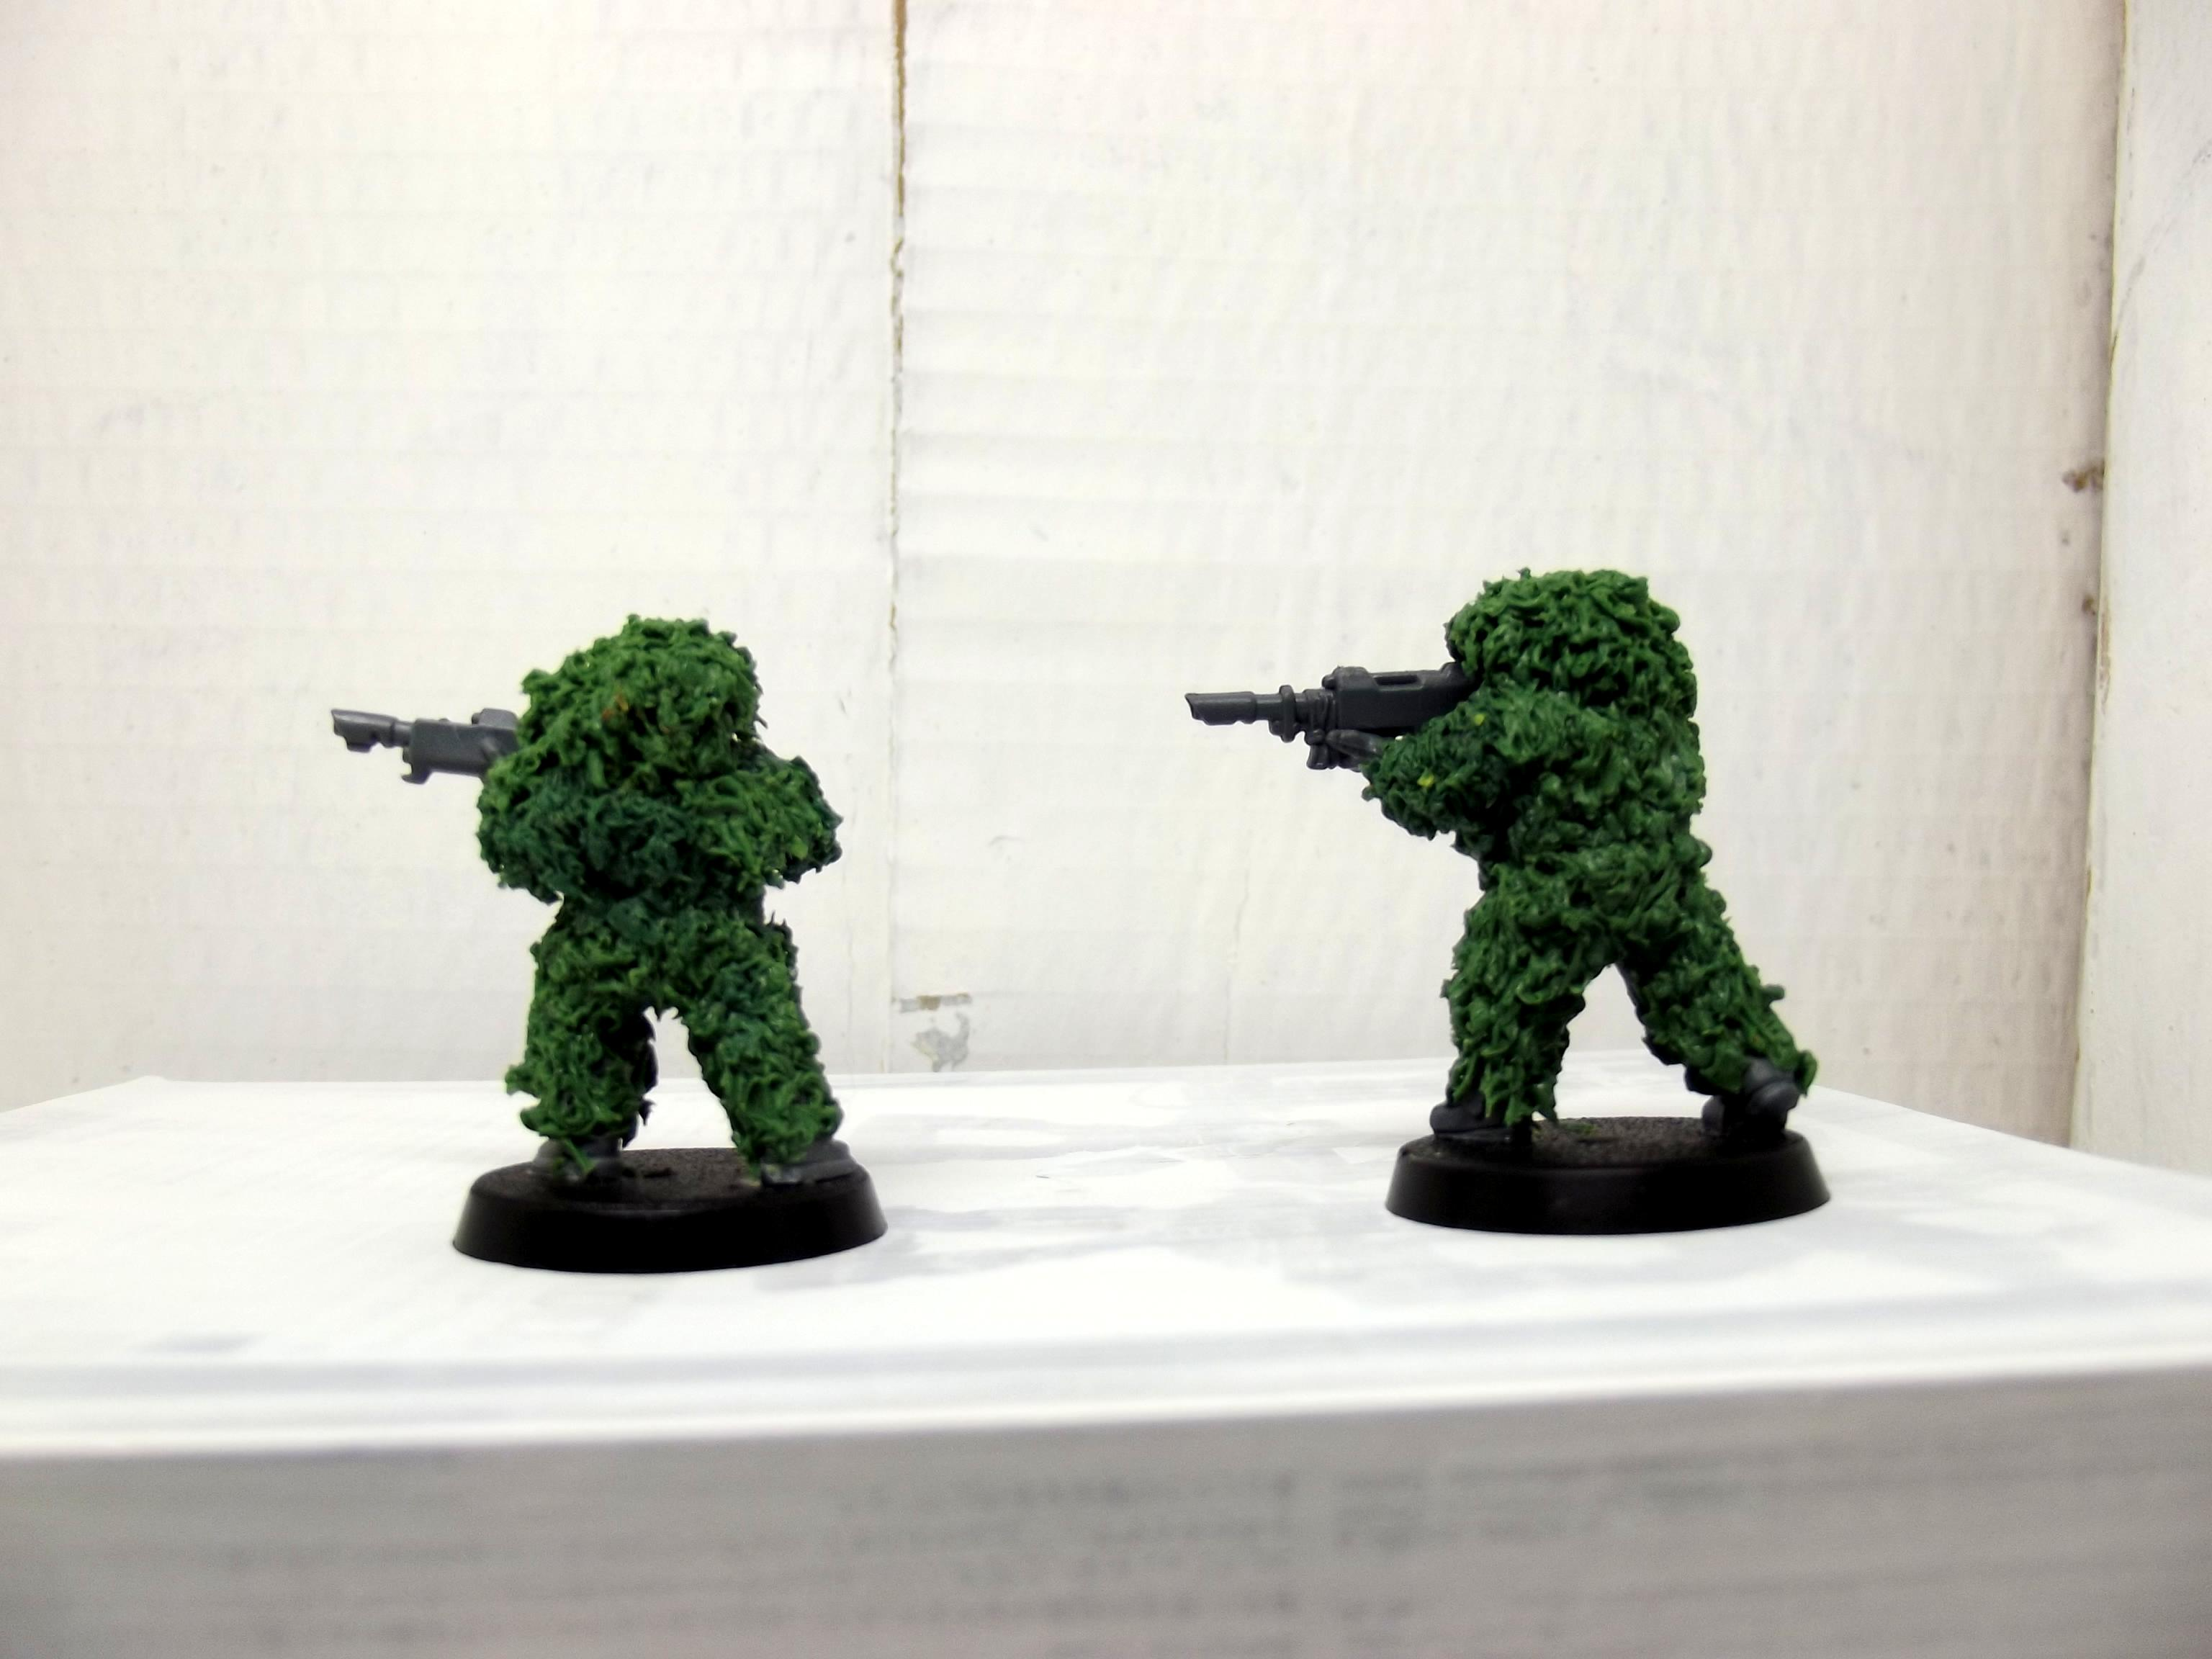 Camo Suit, Greenstuff, Imperial Guard, Lasgun